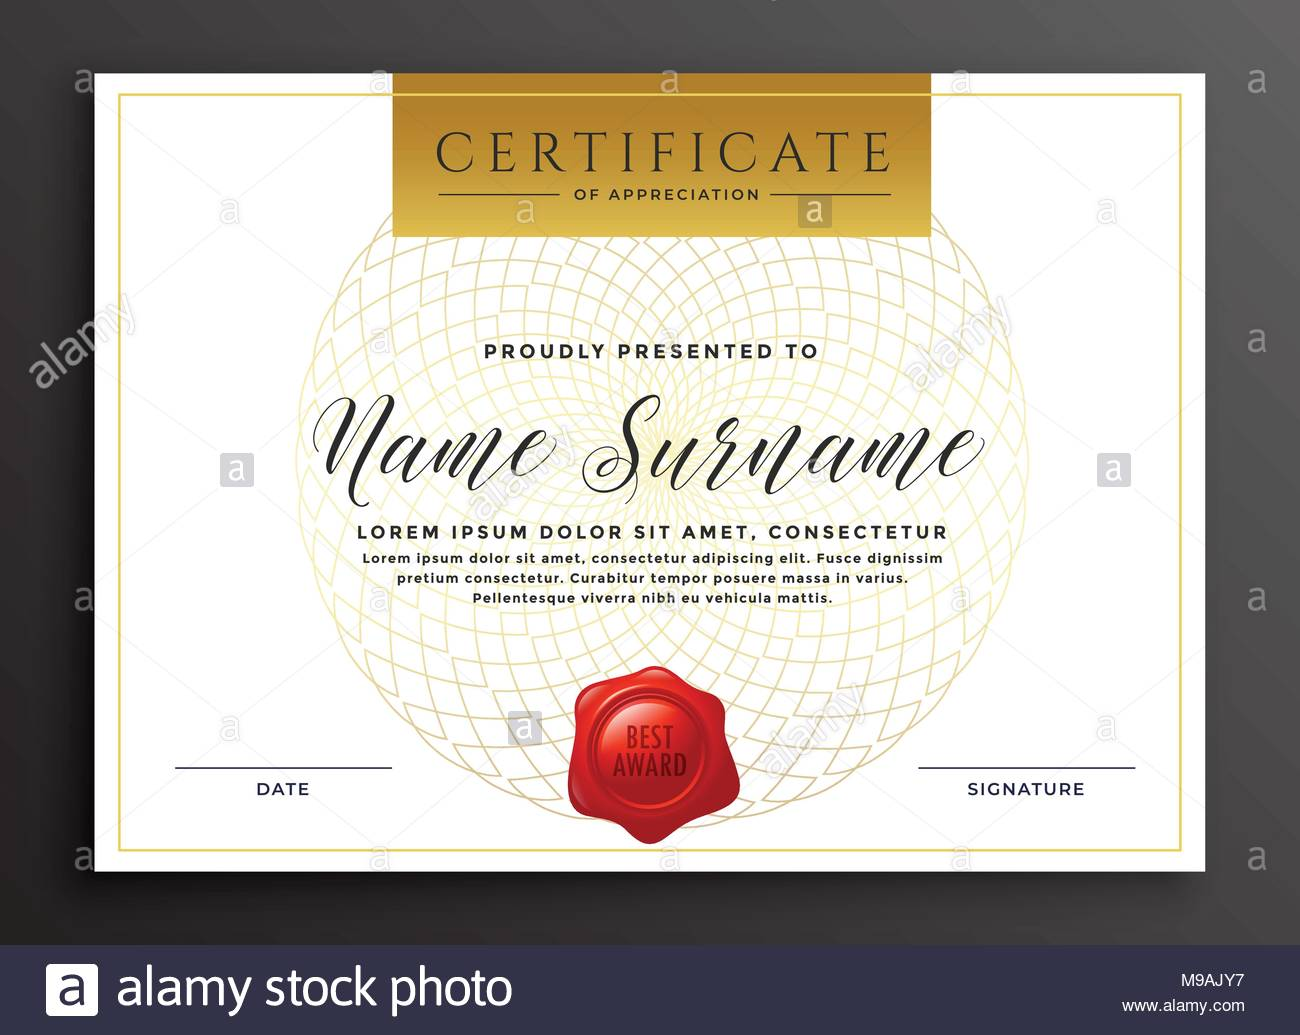 Elegant Luxury Modern Certificate Design Template Stock Vector Art